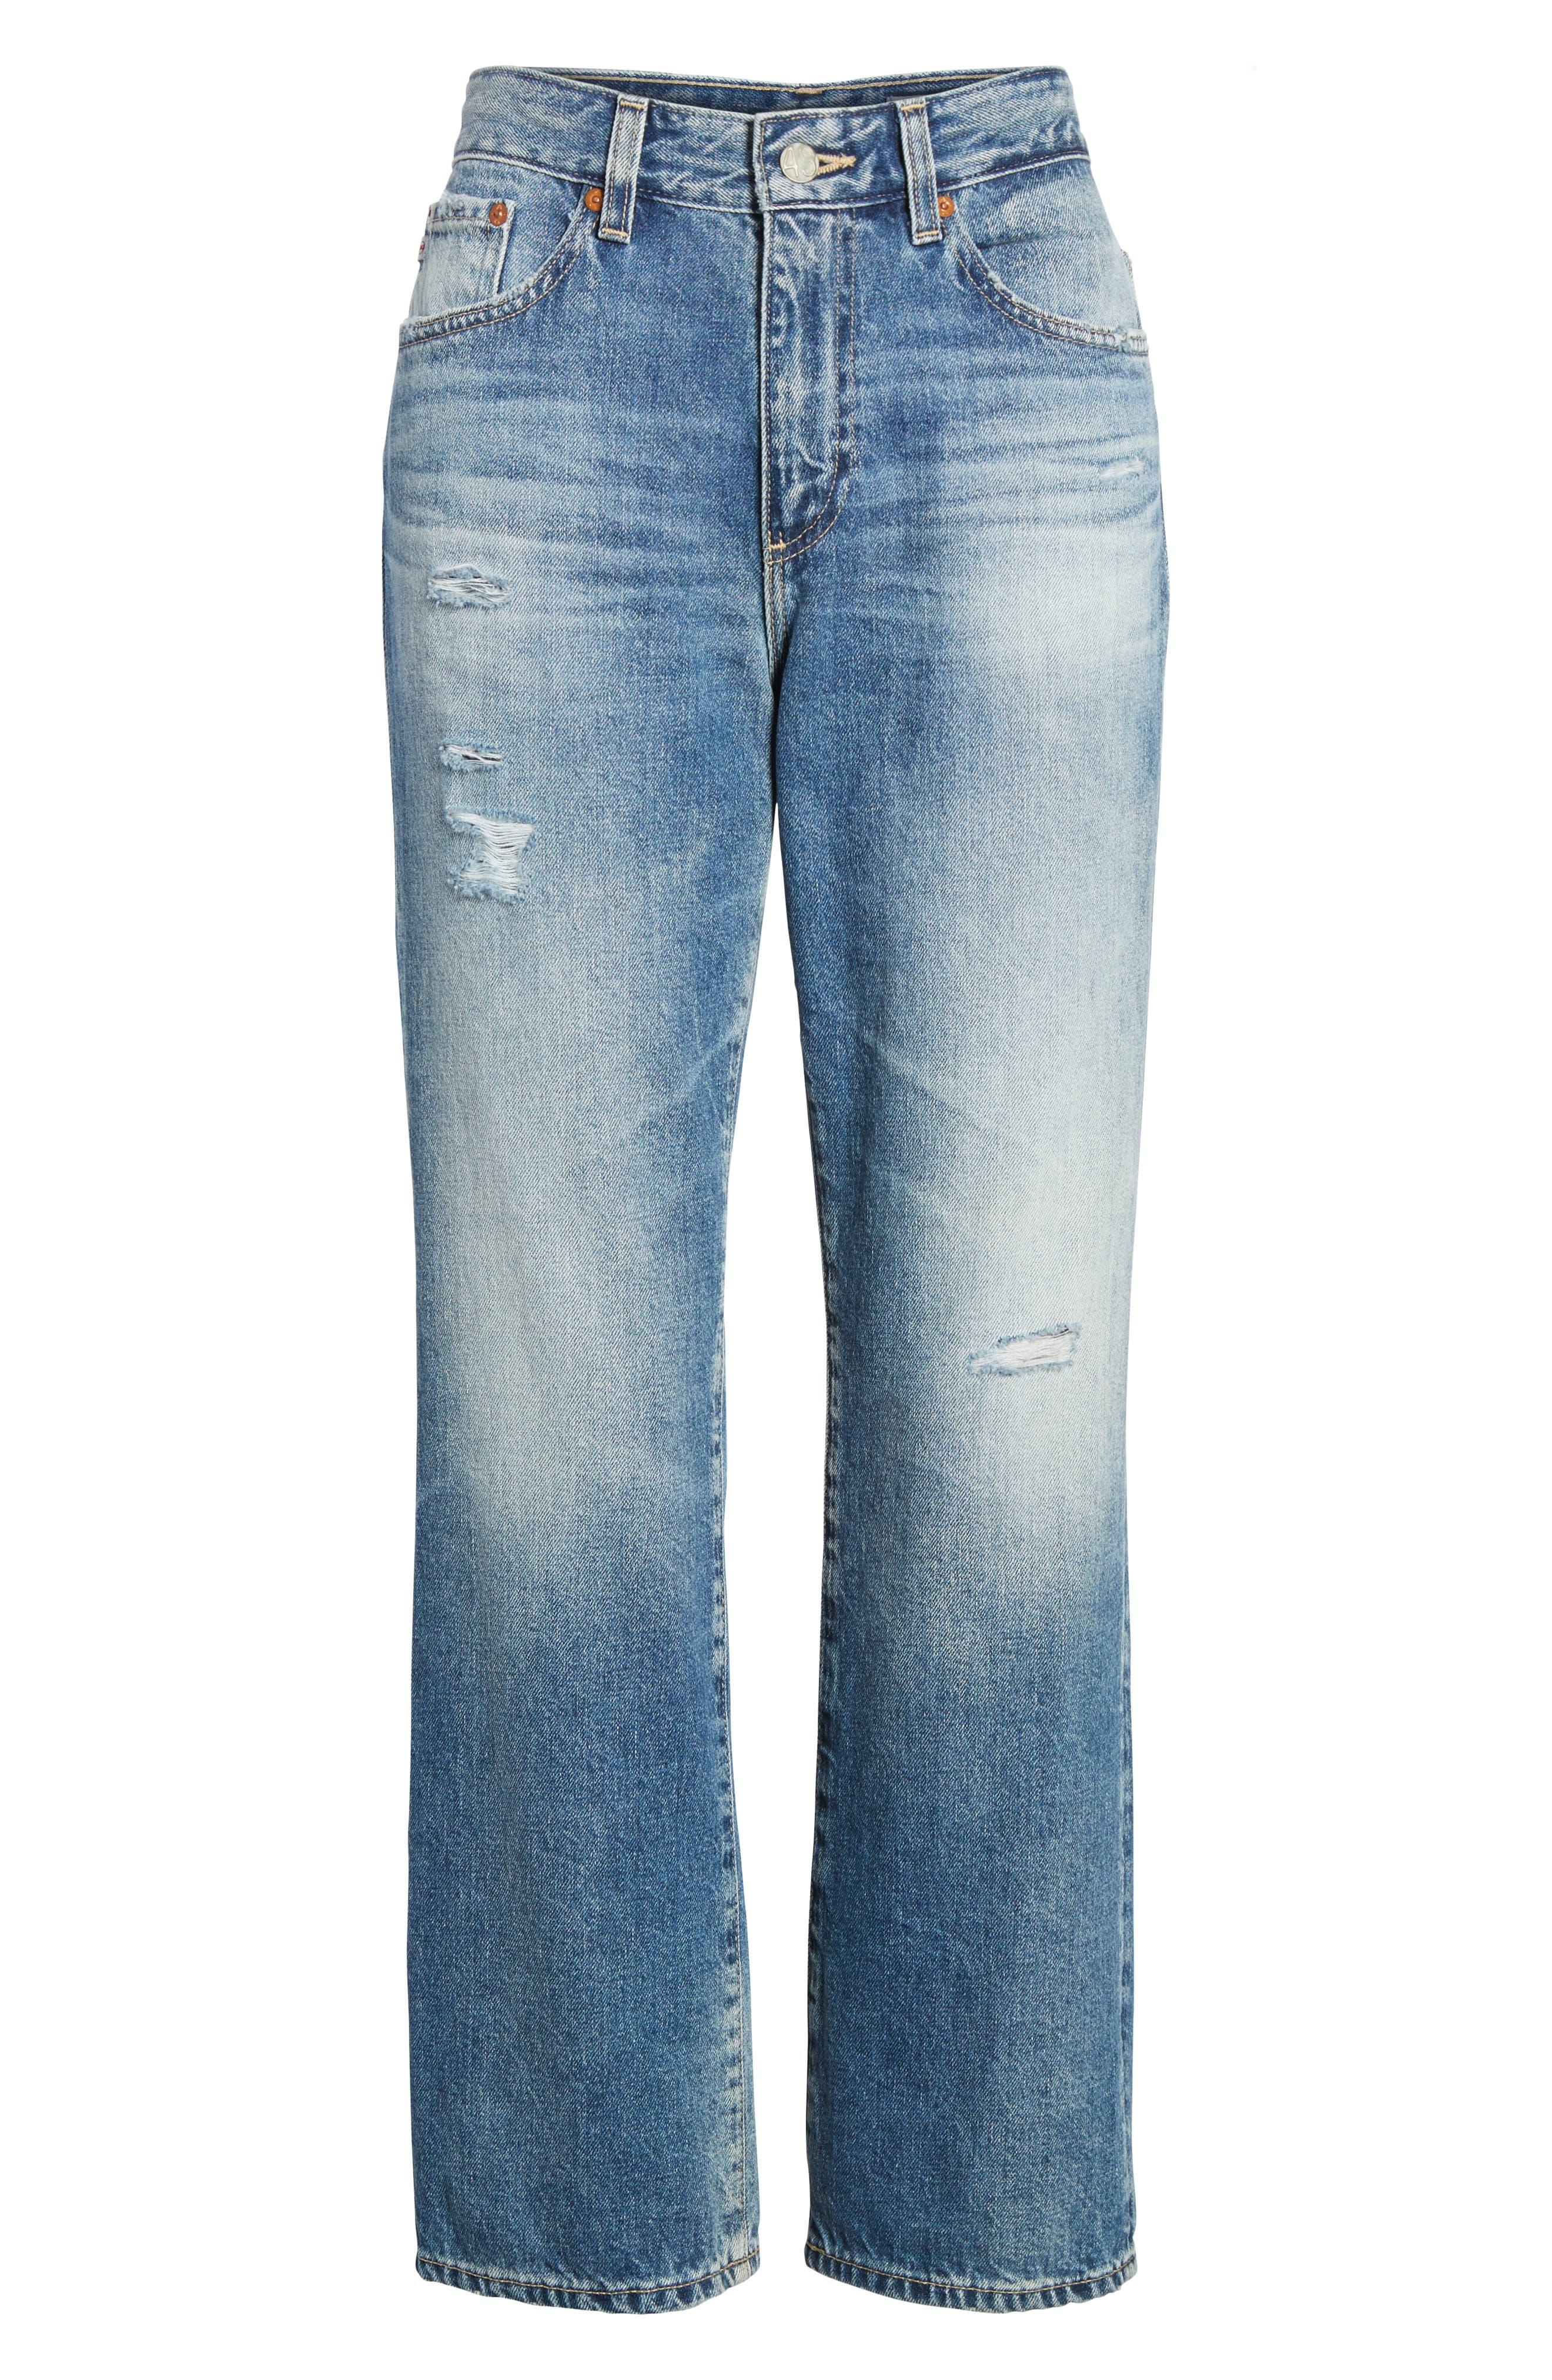 The Rhett Vintage High Waist Crop Jeans,                             Alternate thumbnail 19, color,